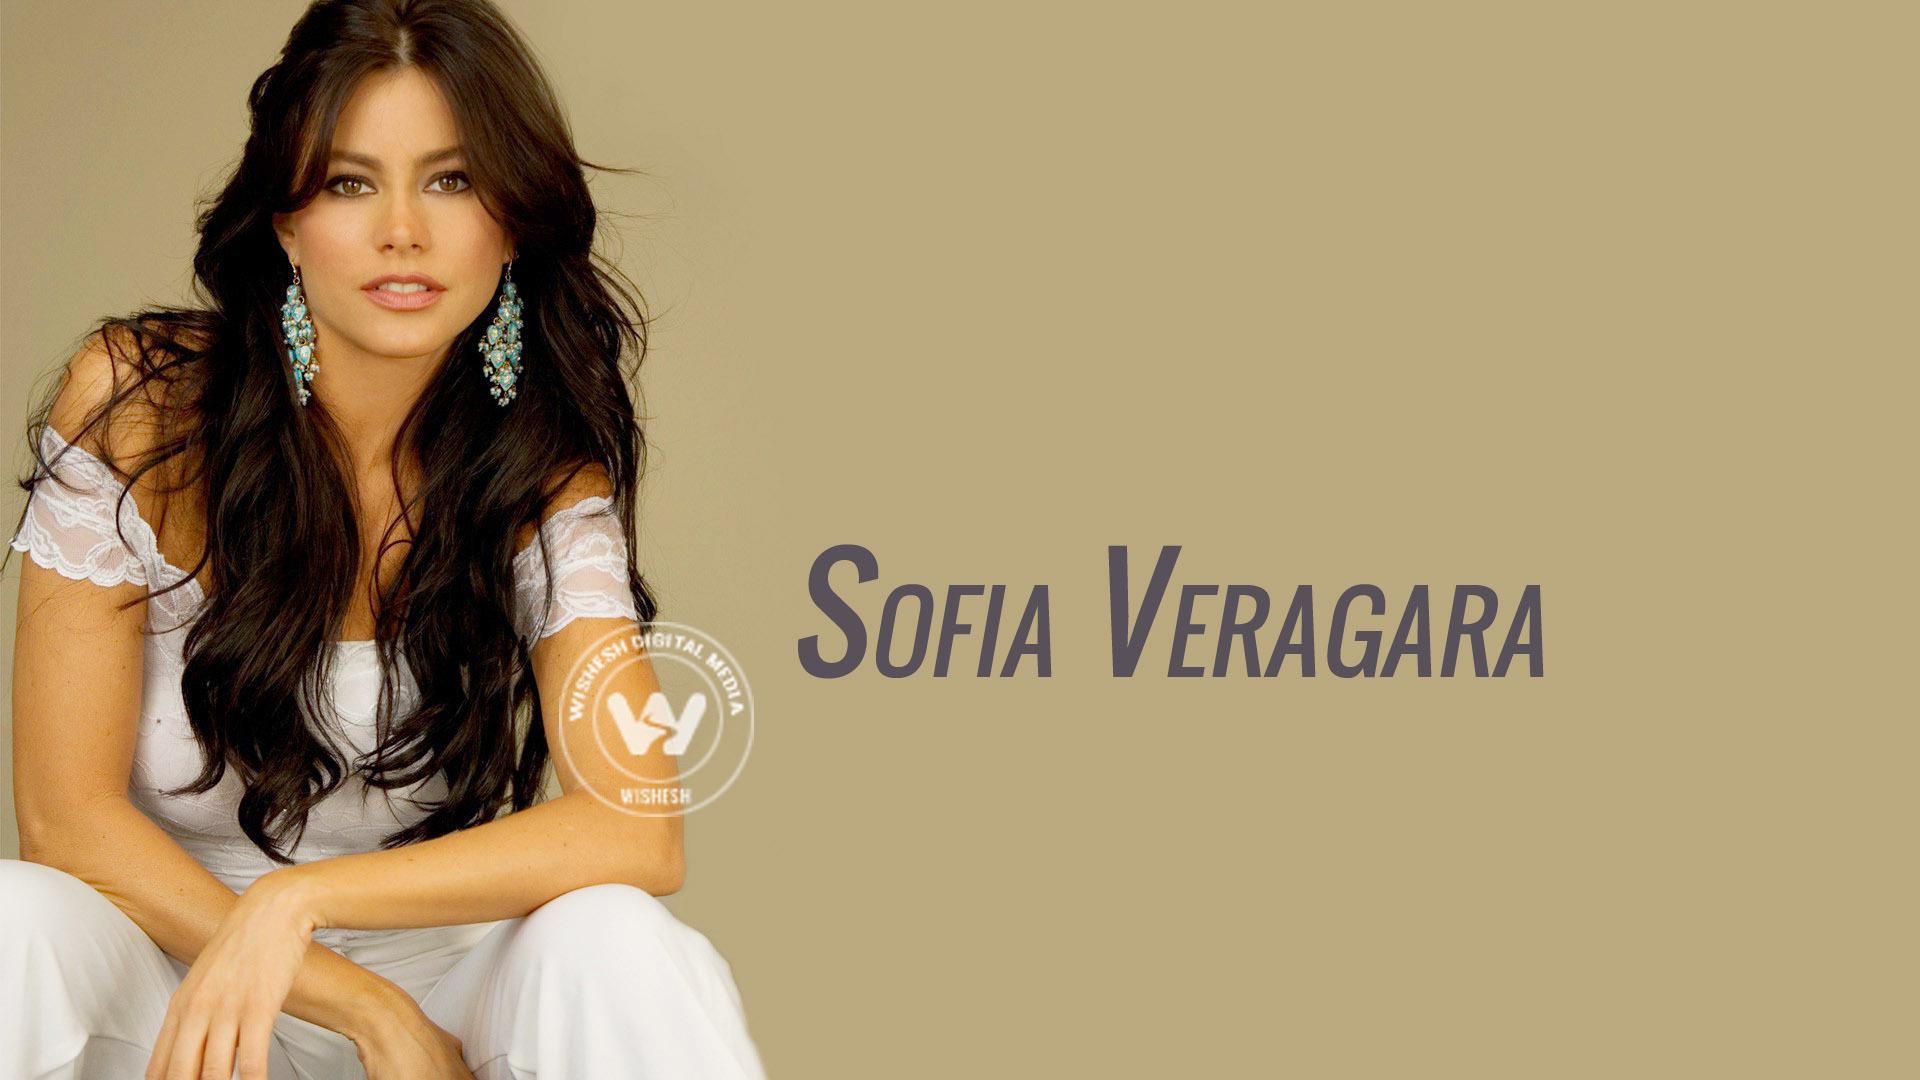 sofia vergara wallpaper wallpapers - photo #33